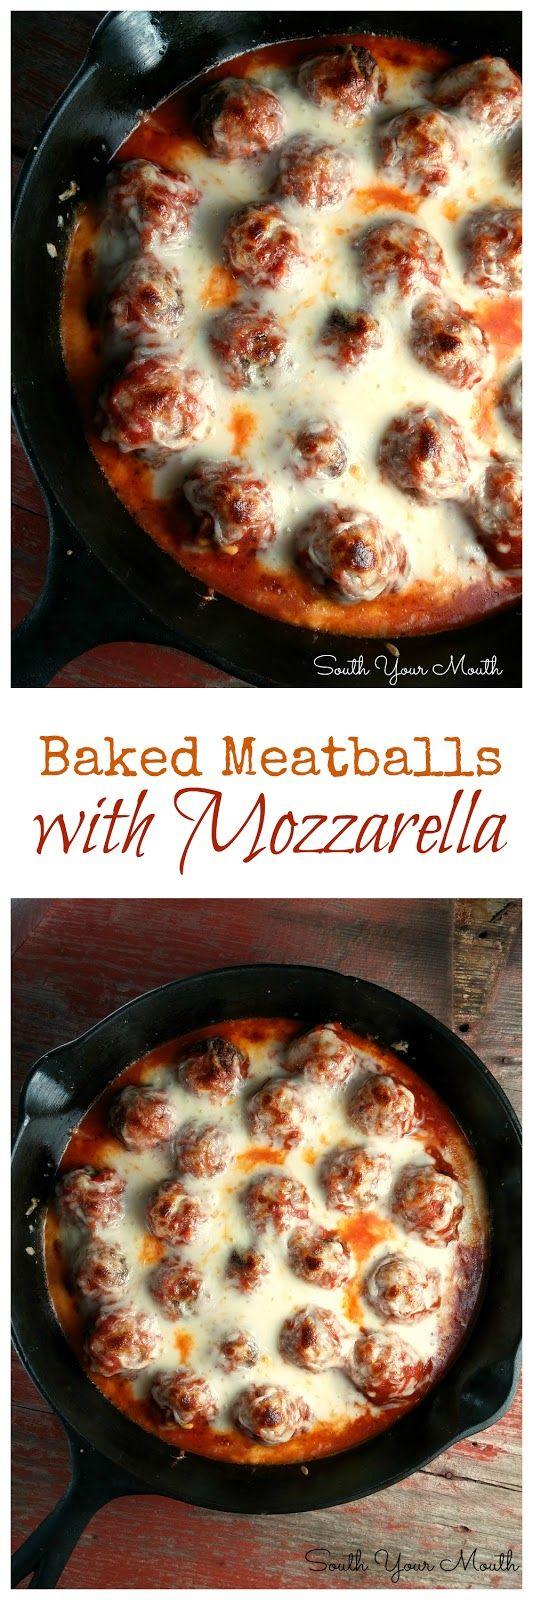 Baked Meatballs with Mozzarella Recipe | Buzz Inspired